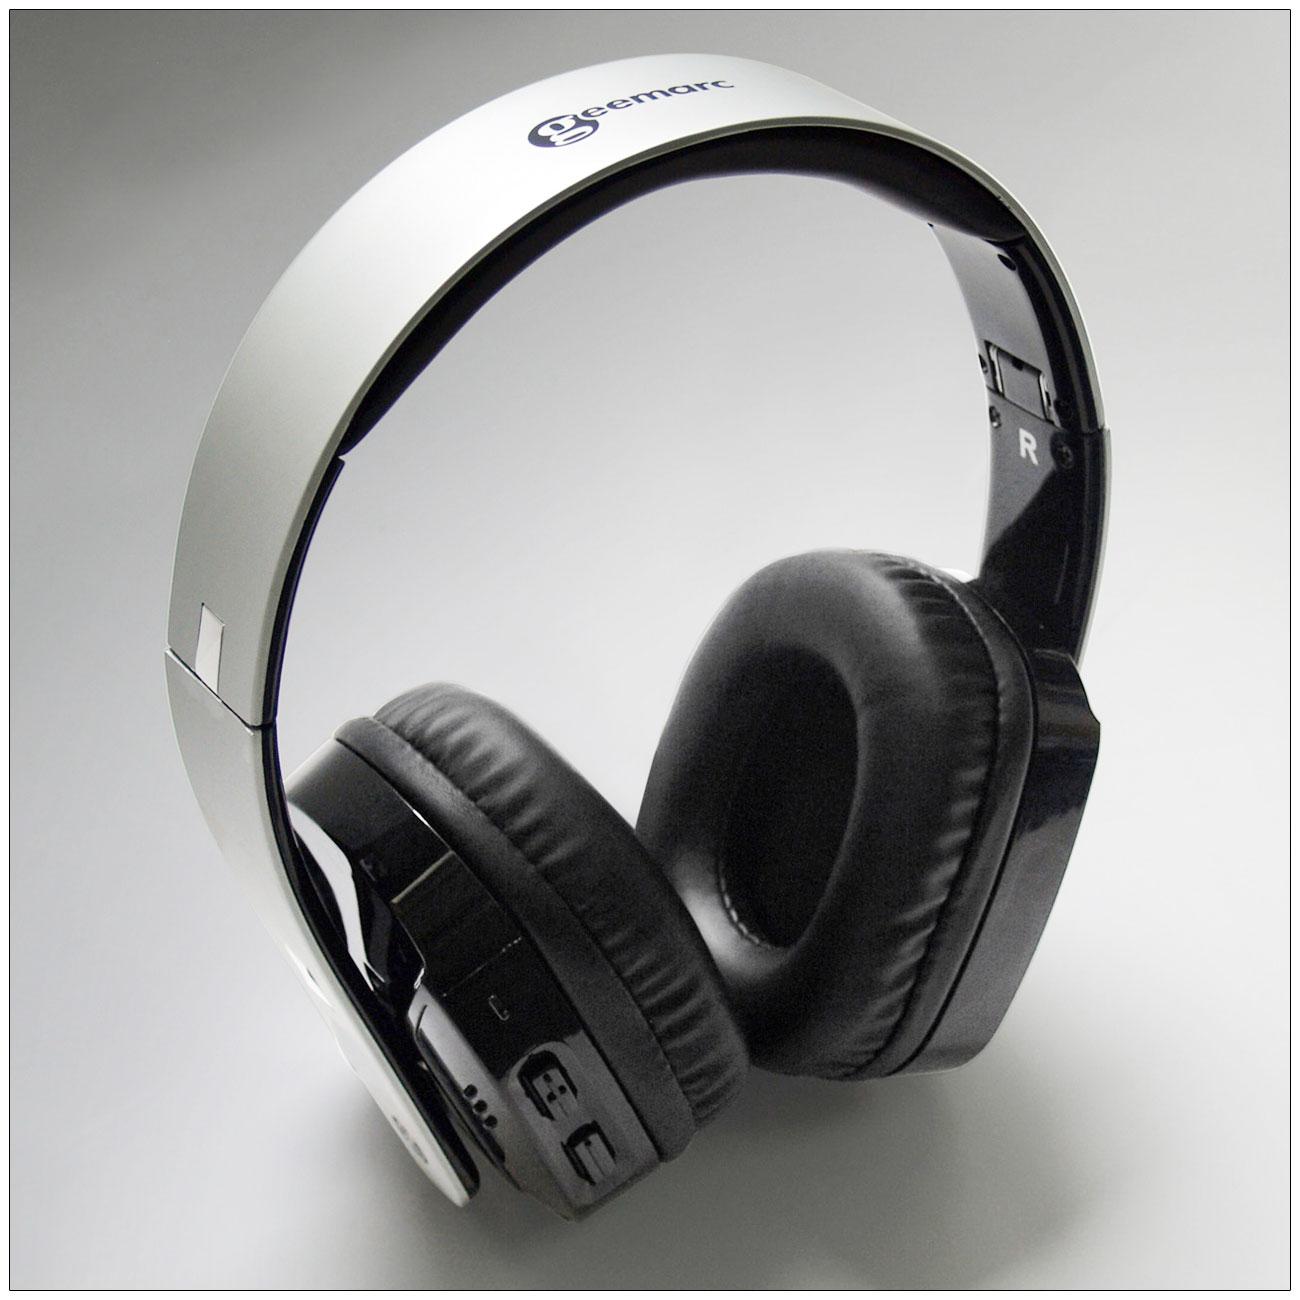 Geemarc Amplified Bluetooth Stereo Headphones CL7400BT